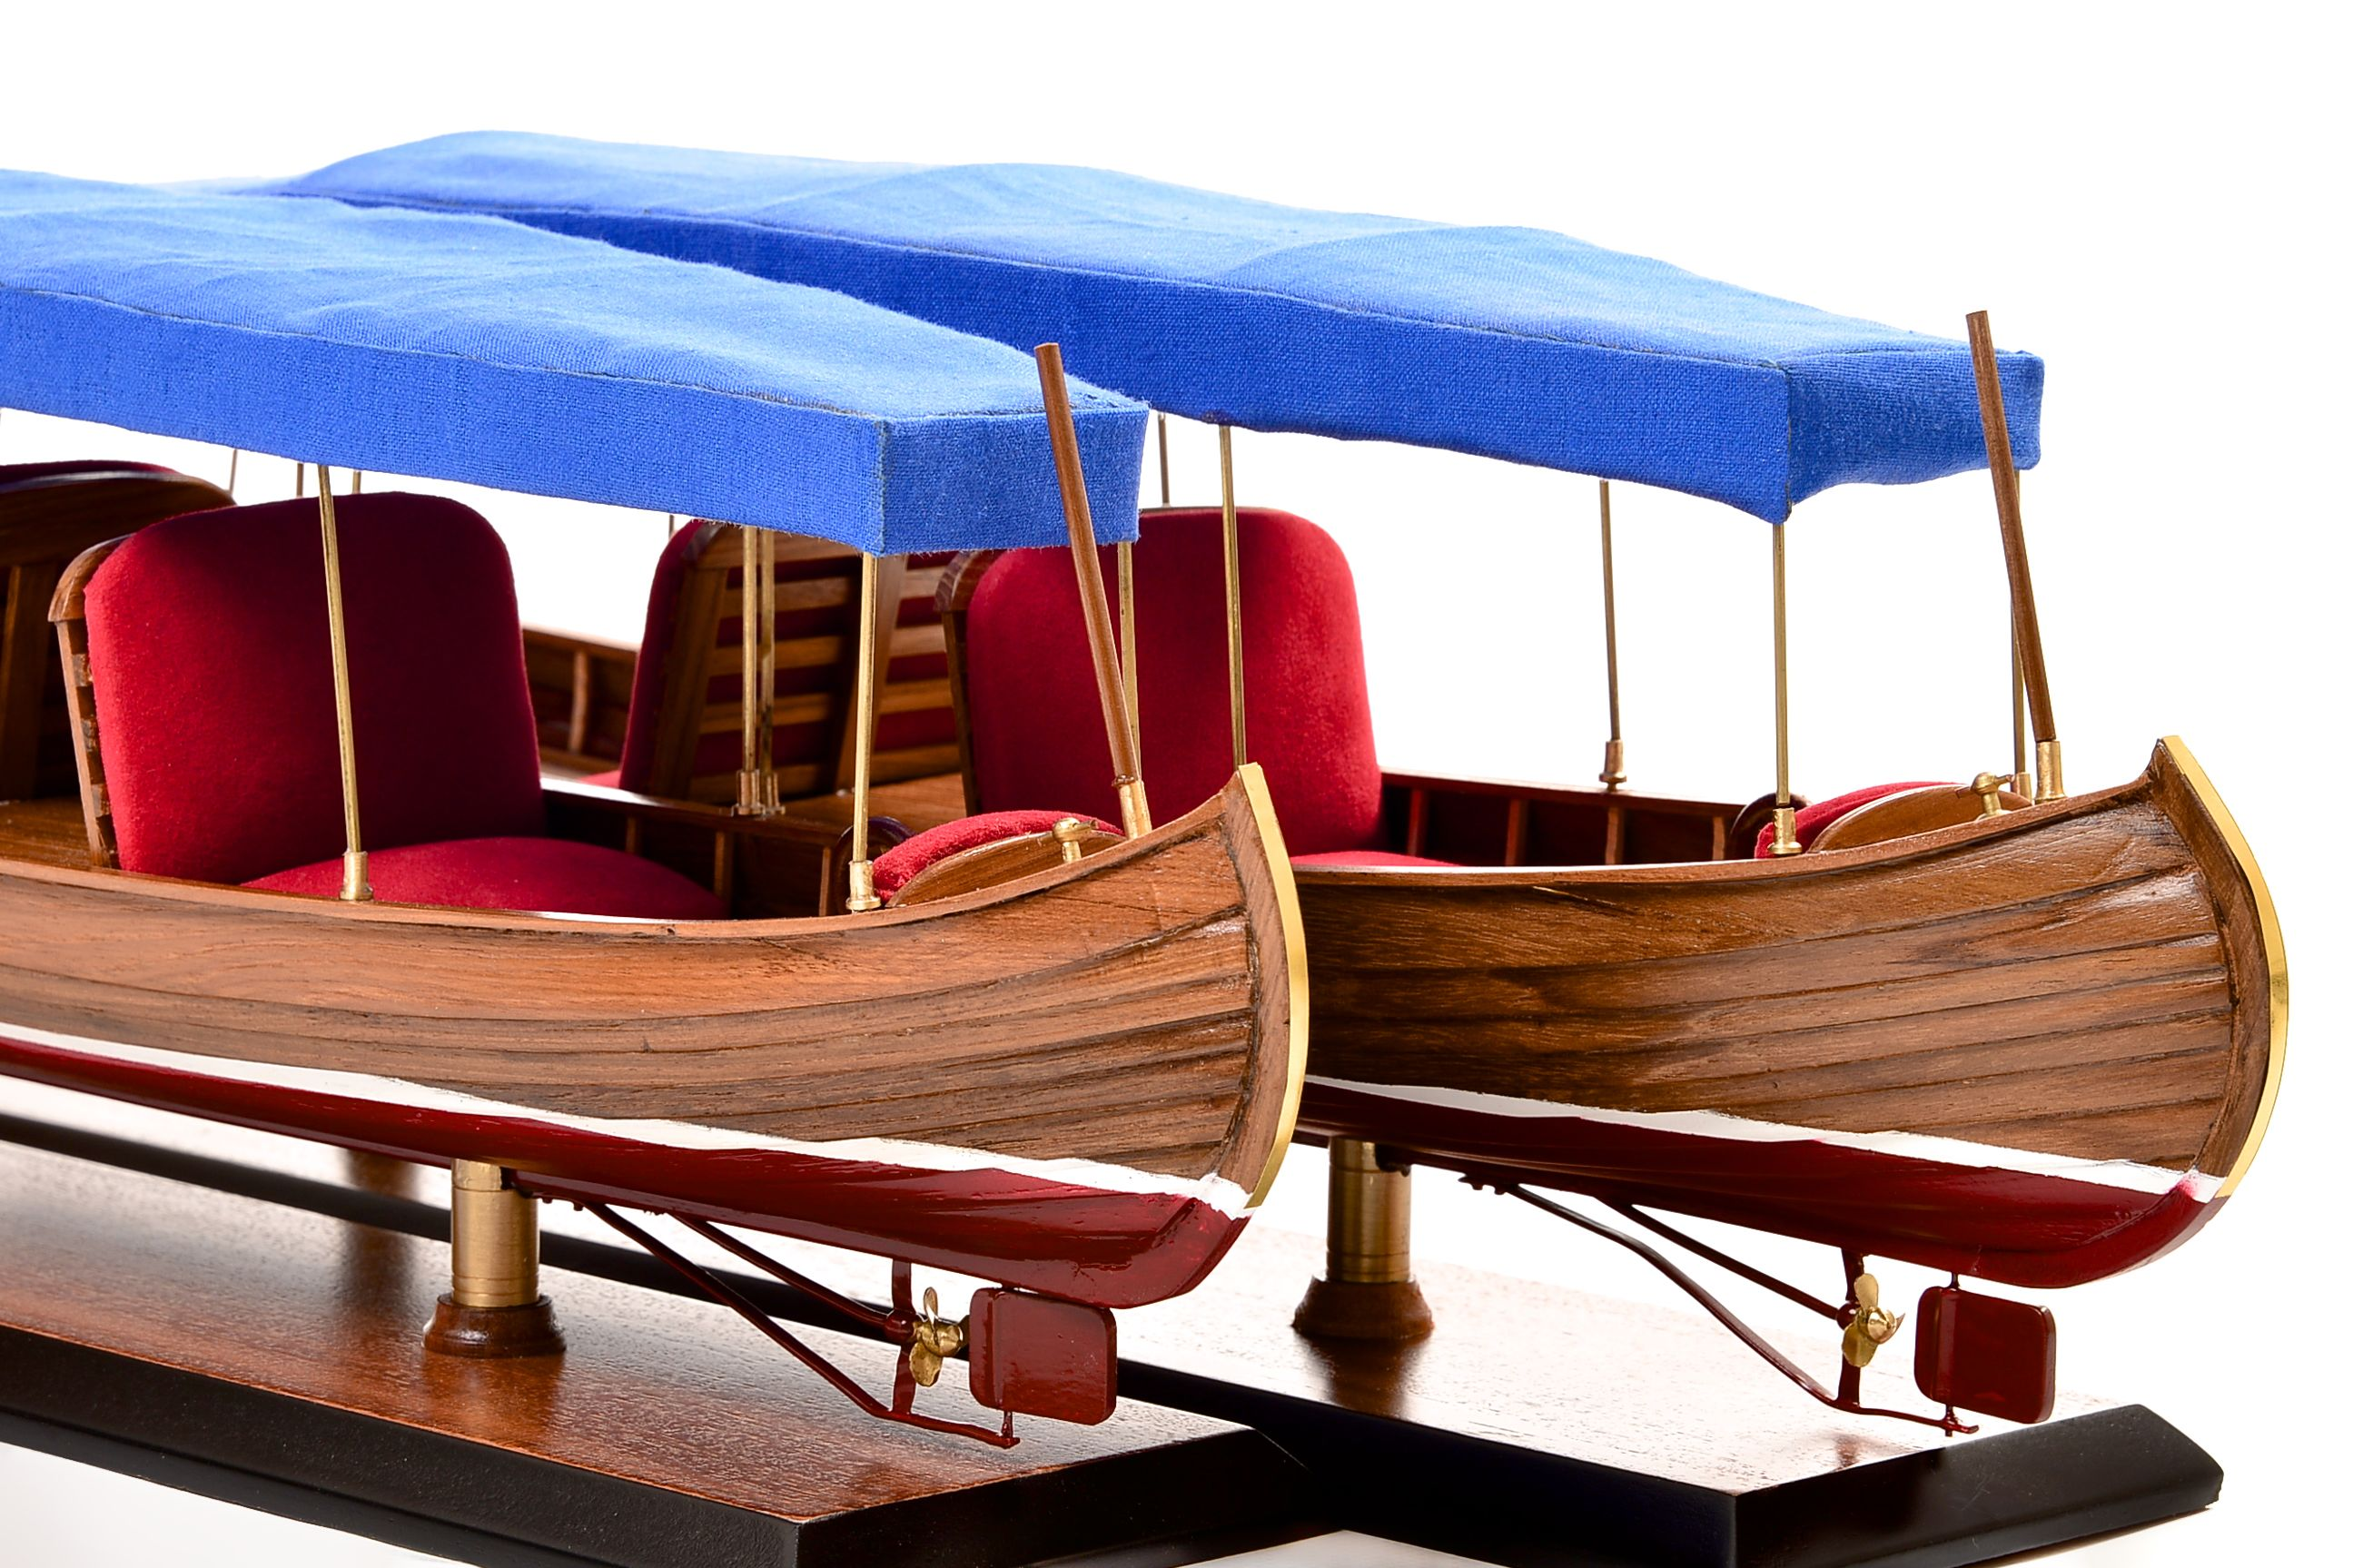 1865-11248-Liddesdale-Electric-Canoe-1920